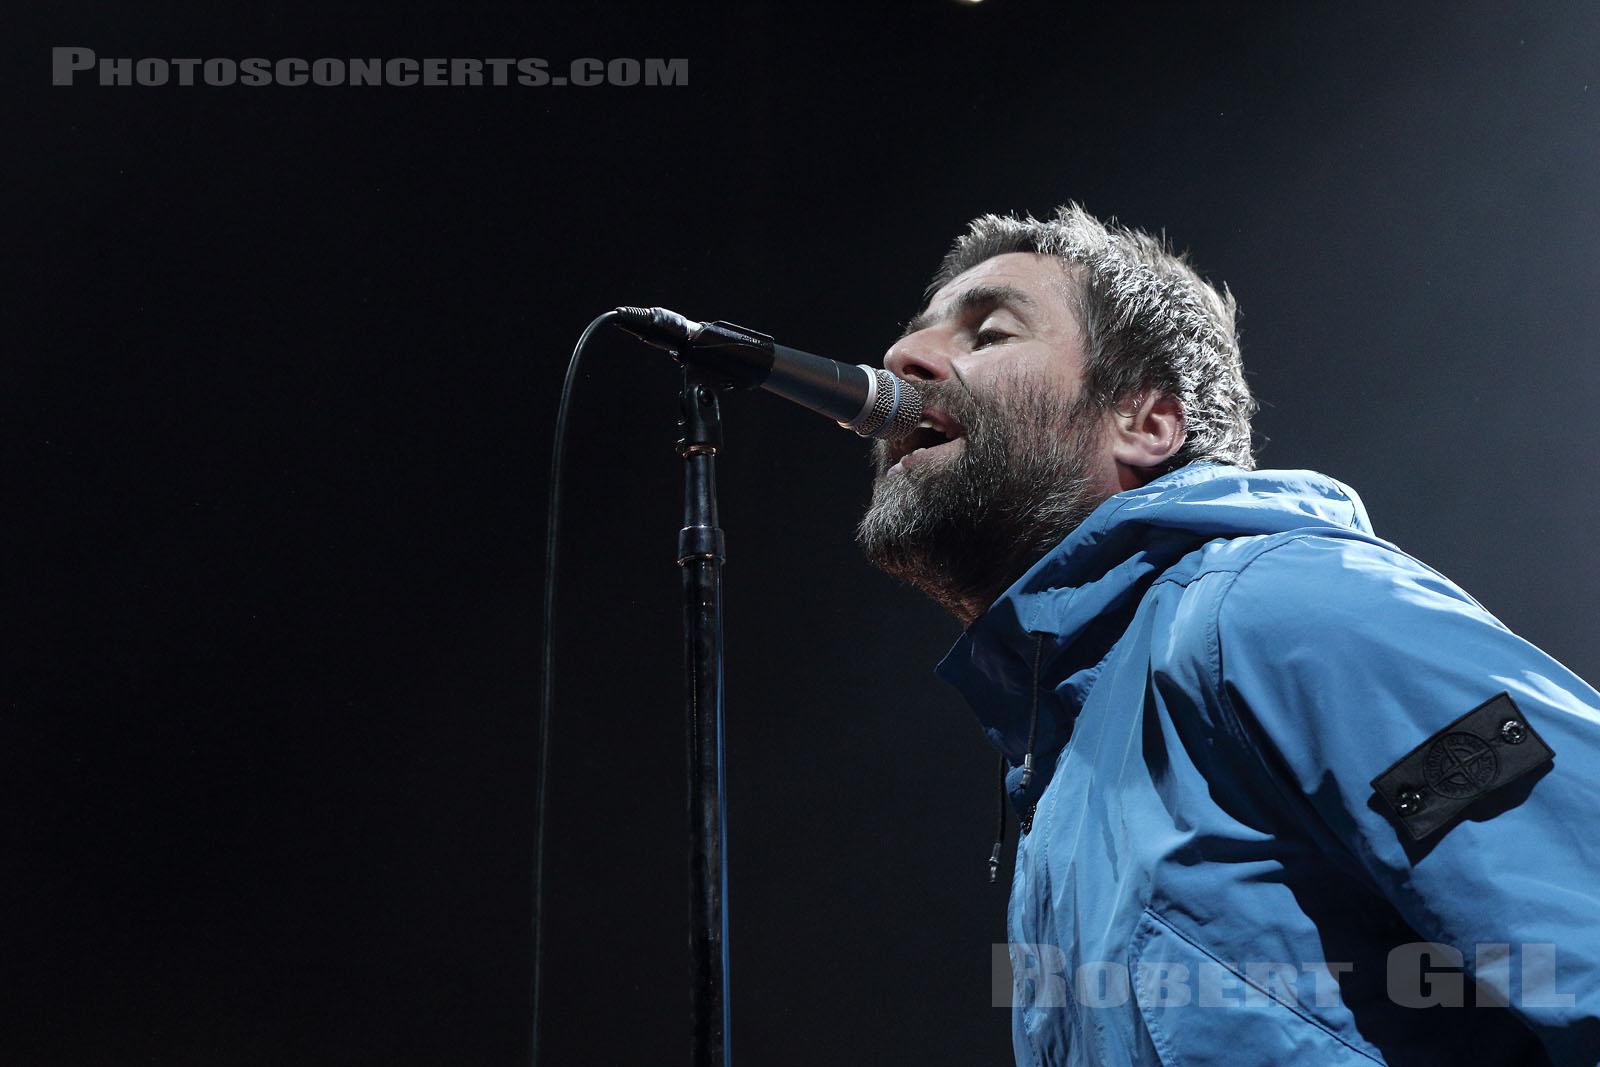 Photo : LIAM GALLAGHER, Olympia (PARIS) - 2018-03-02 - Robert GIL (PhotosConcerts.com ...